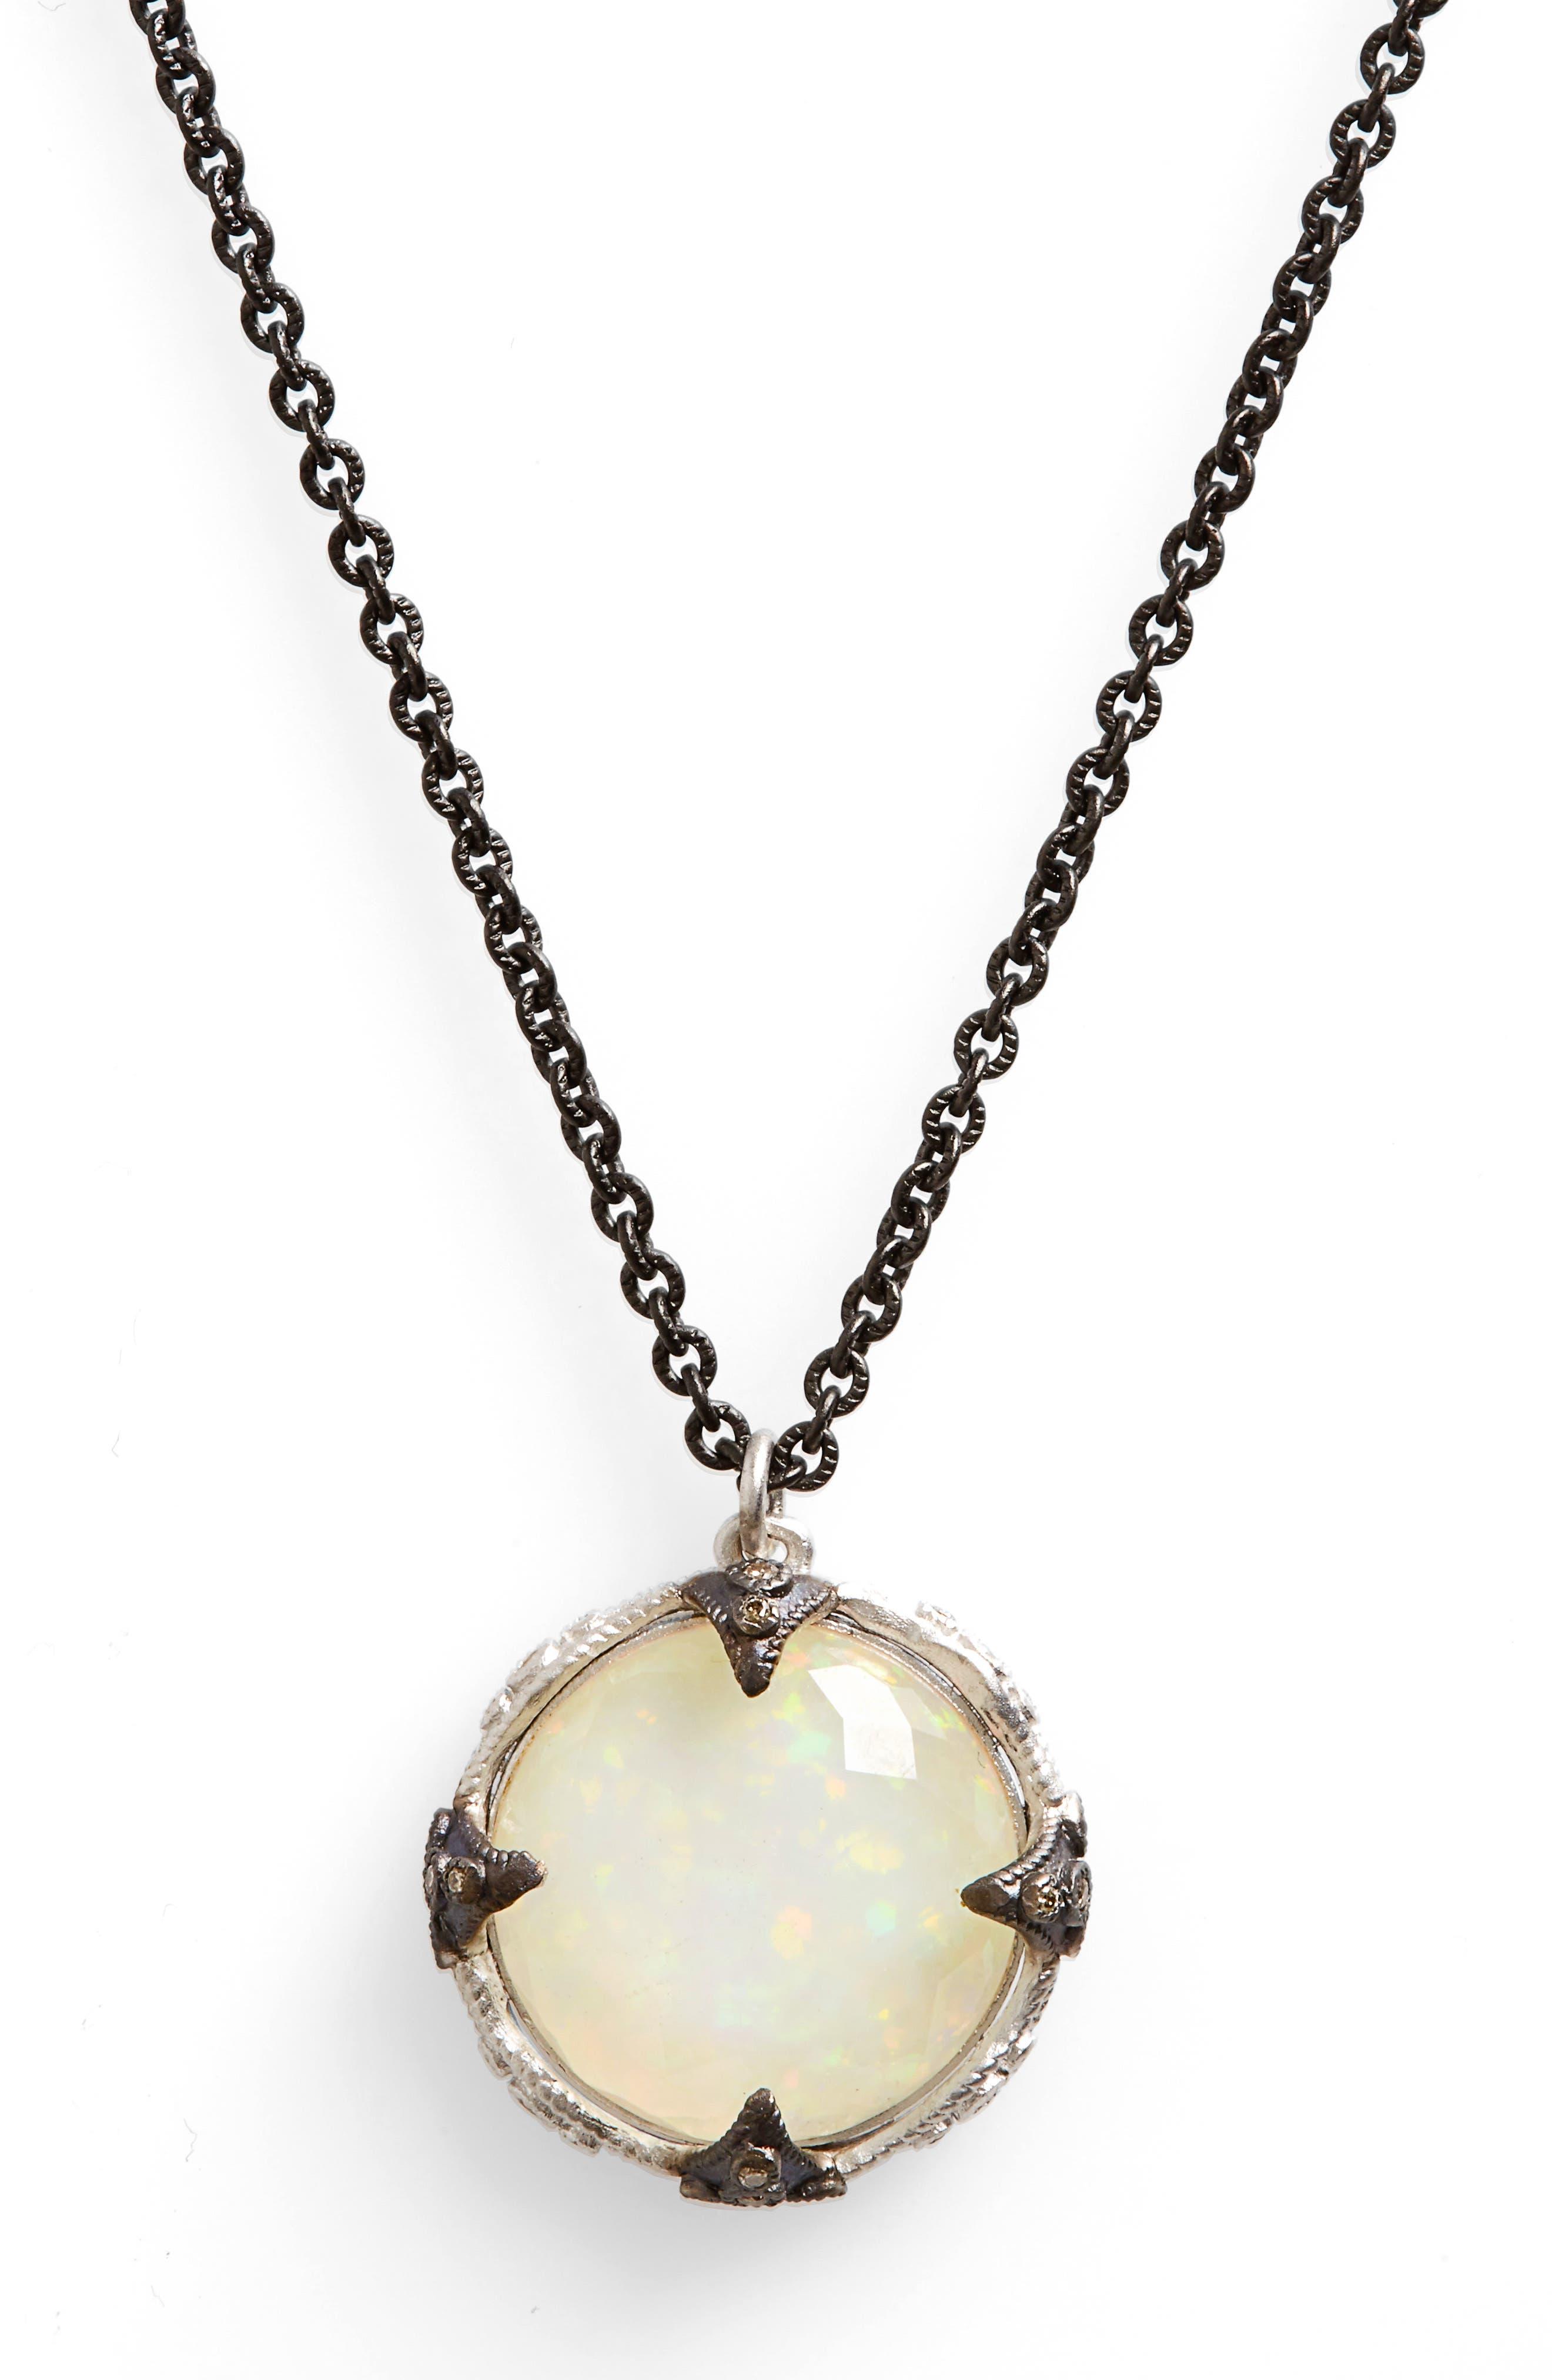 Armenta New World Crivelli Opal Pendant Necklace